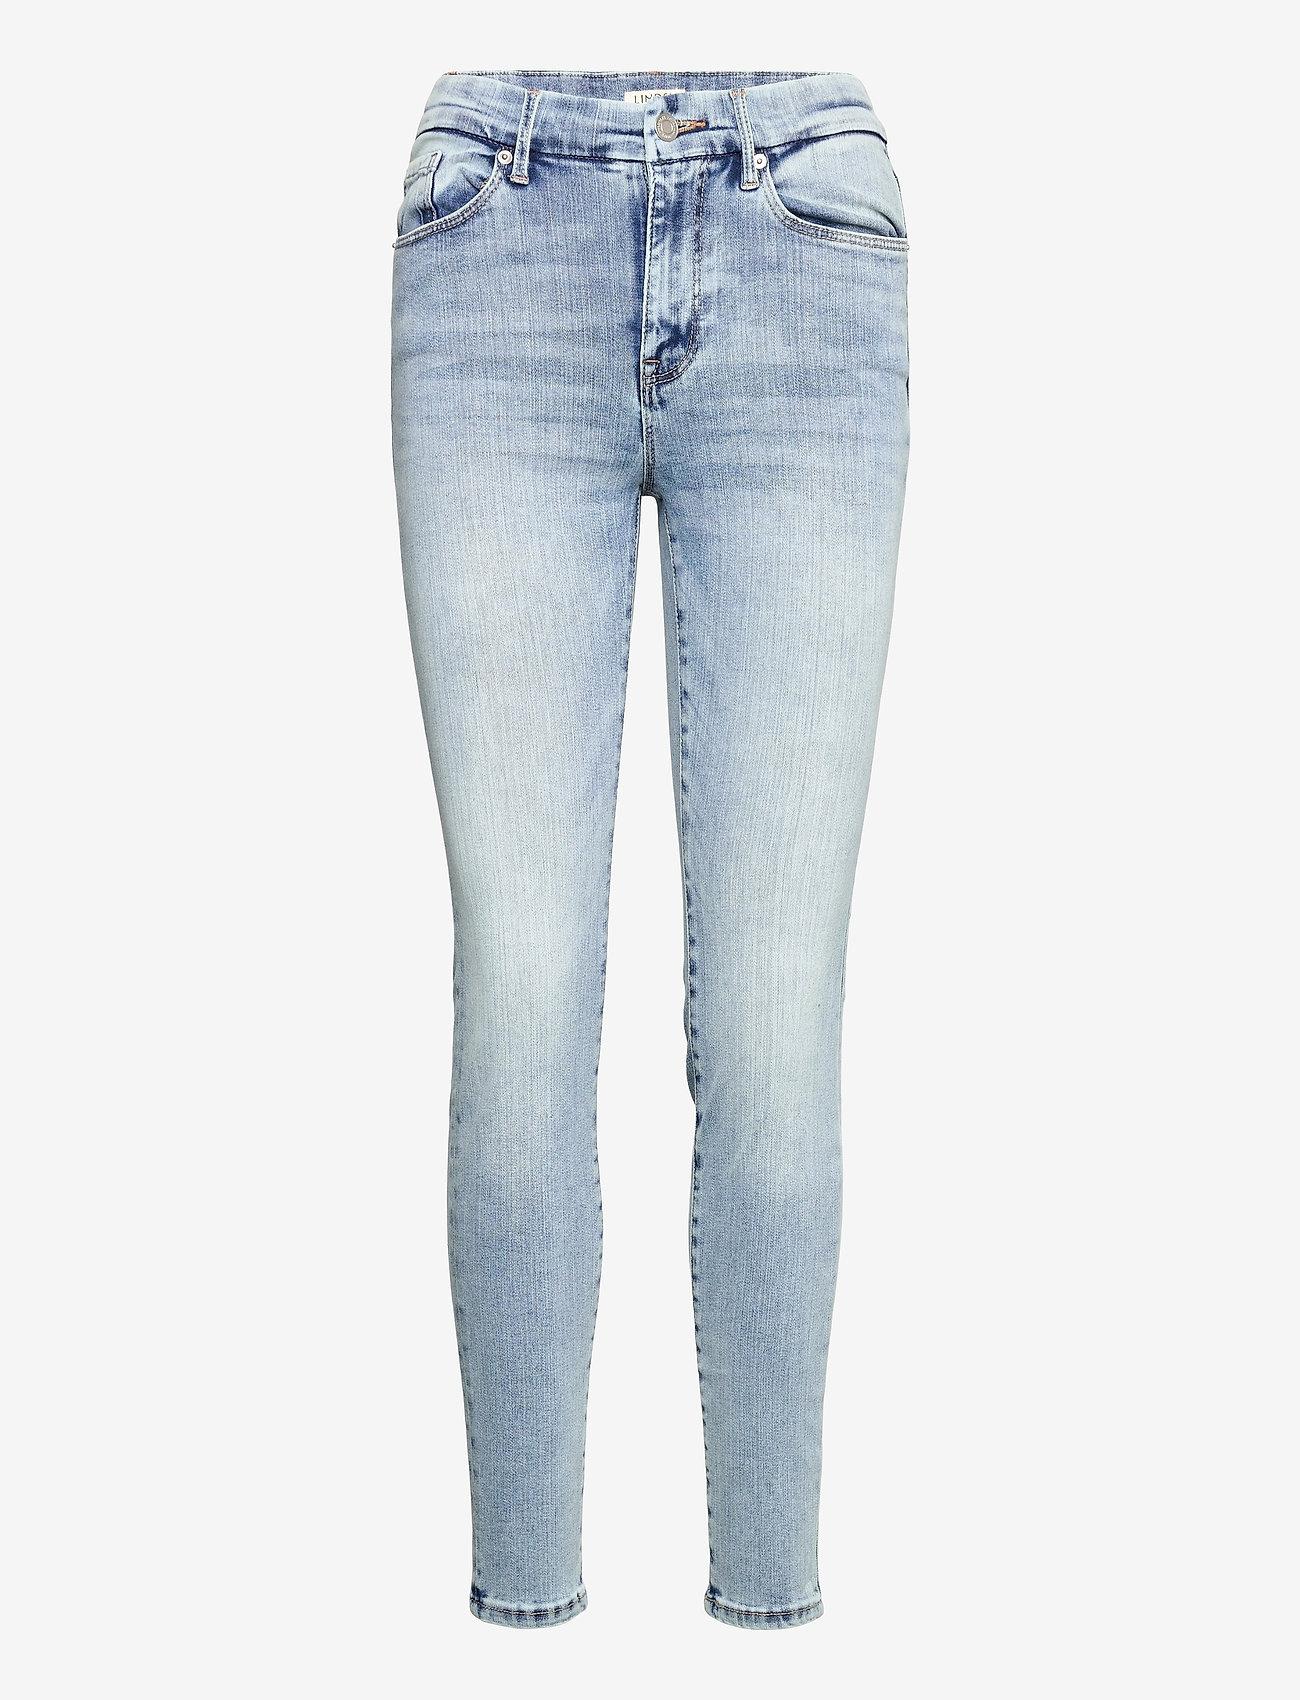 Lindex - Trousers denim Clara lt blue - slim jeans - blue - 0